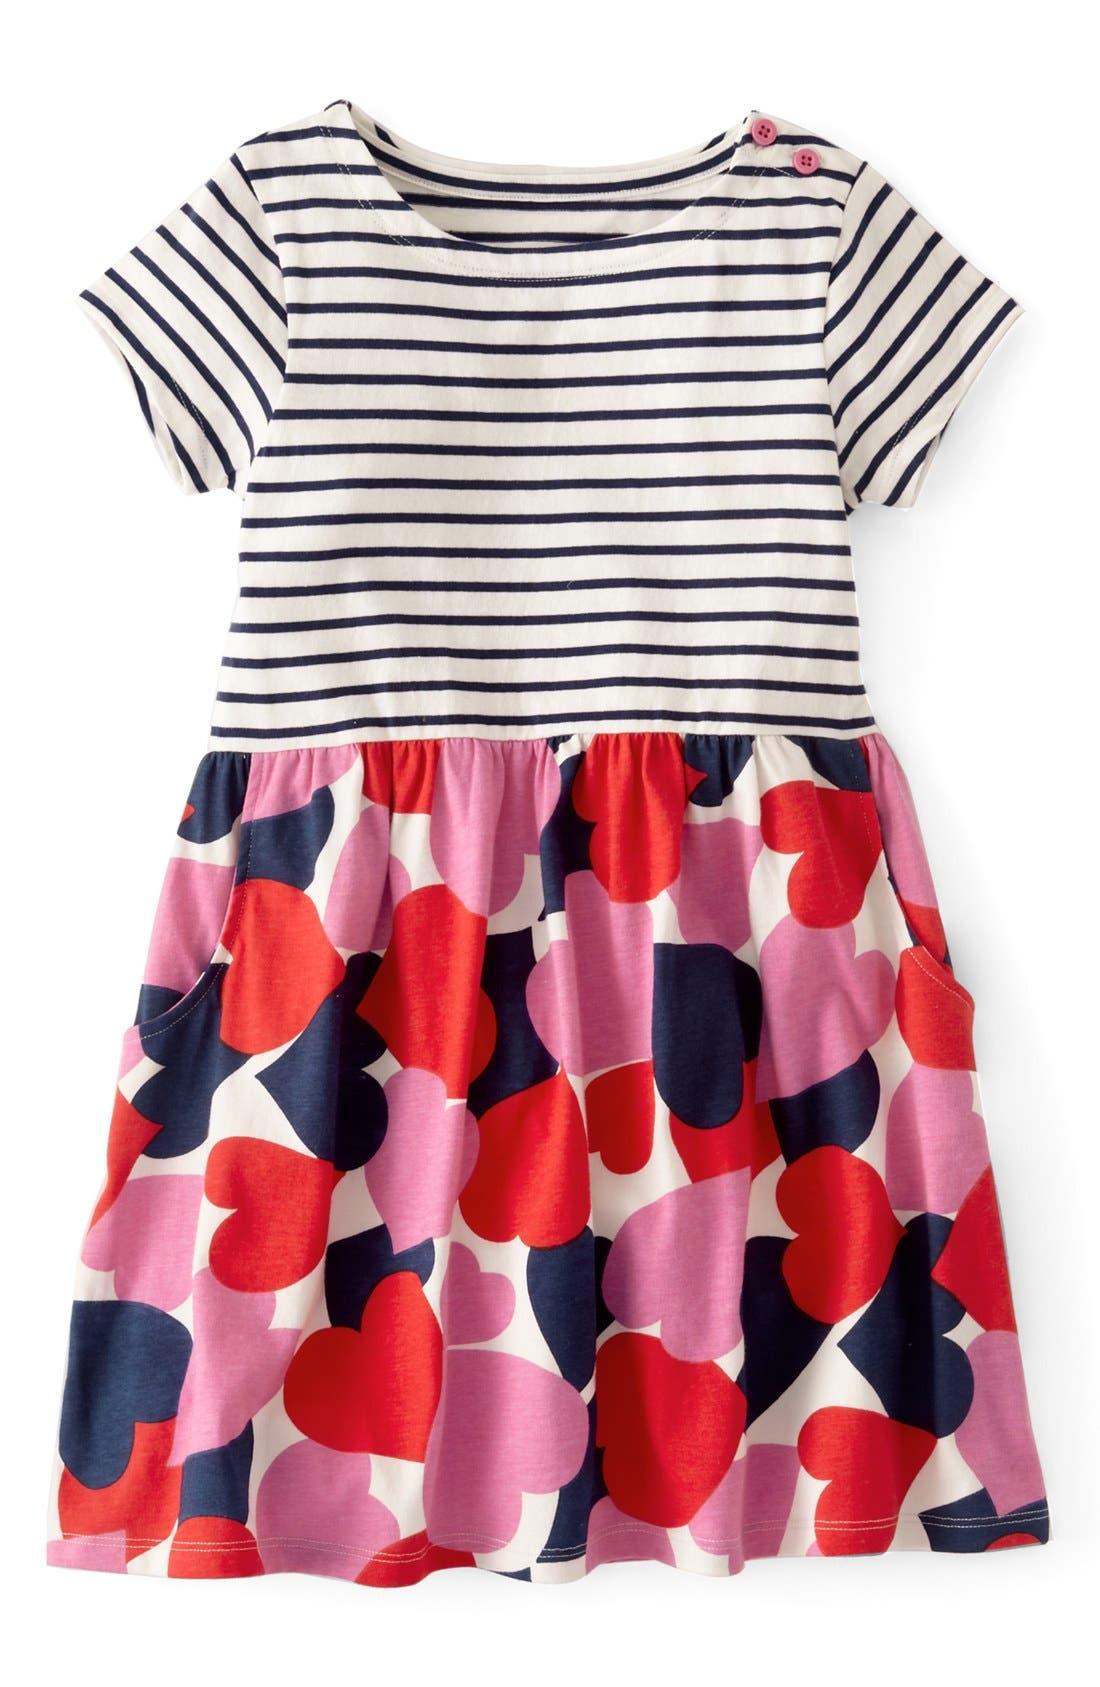 Alternate Image 1 Selected - Mini Boden 'Hotchpotch' Jersey Dress (Toddler Girls, Little Girls & Big Girls)(Online Only)